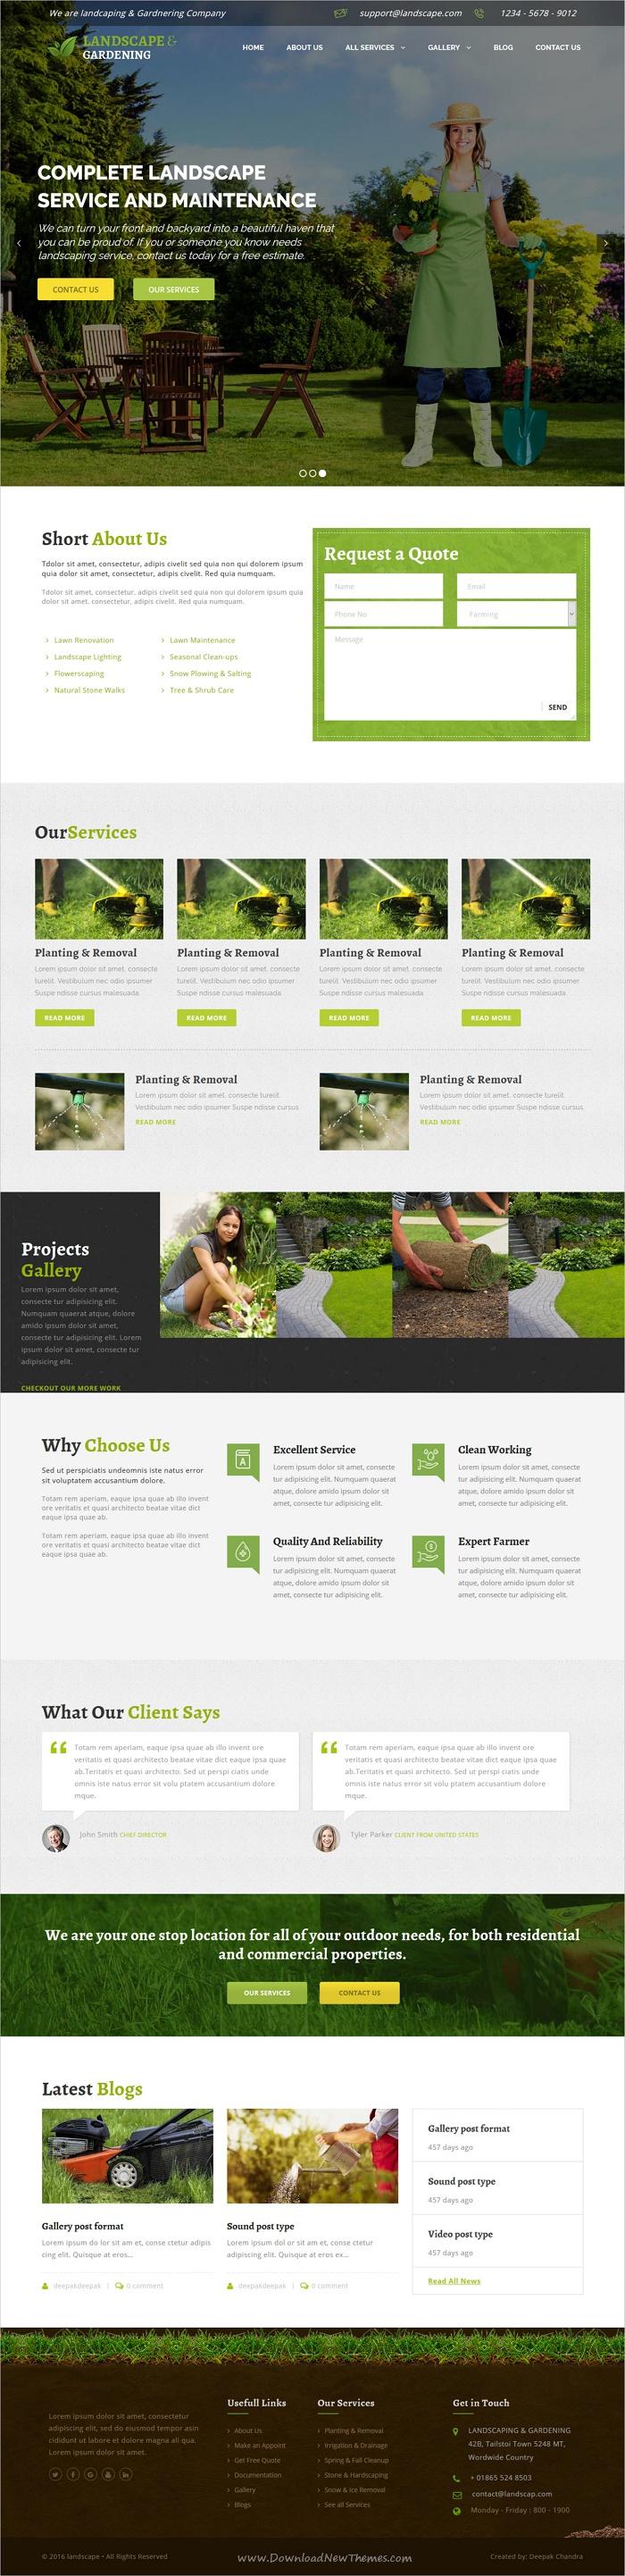 Landscape Wordpress Theme For Gardening Landscaping Landscape Landscape Services Amazing Website Designs